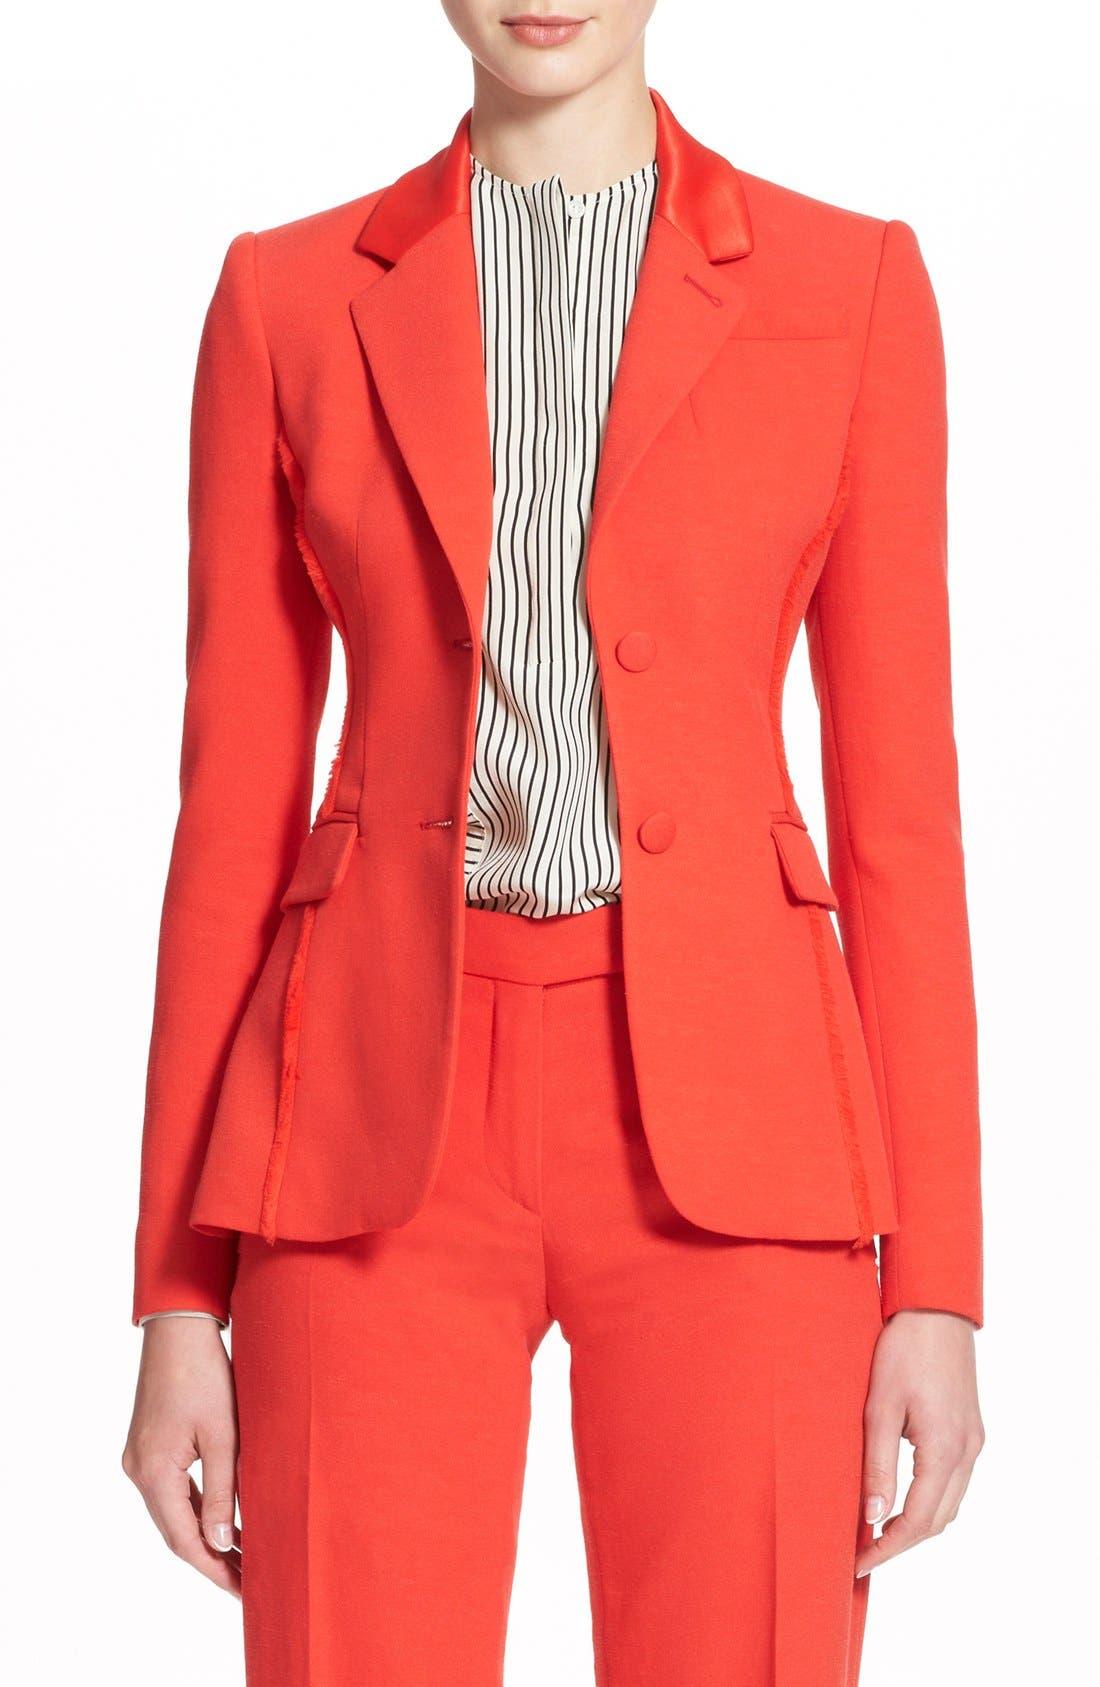 Alternate Image 1 Selected - Altuzarra 'Fenice' Textured Blazer with Fraying Fringe